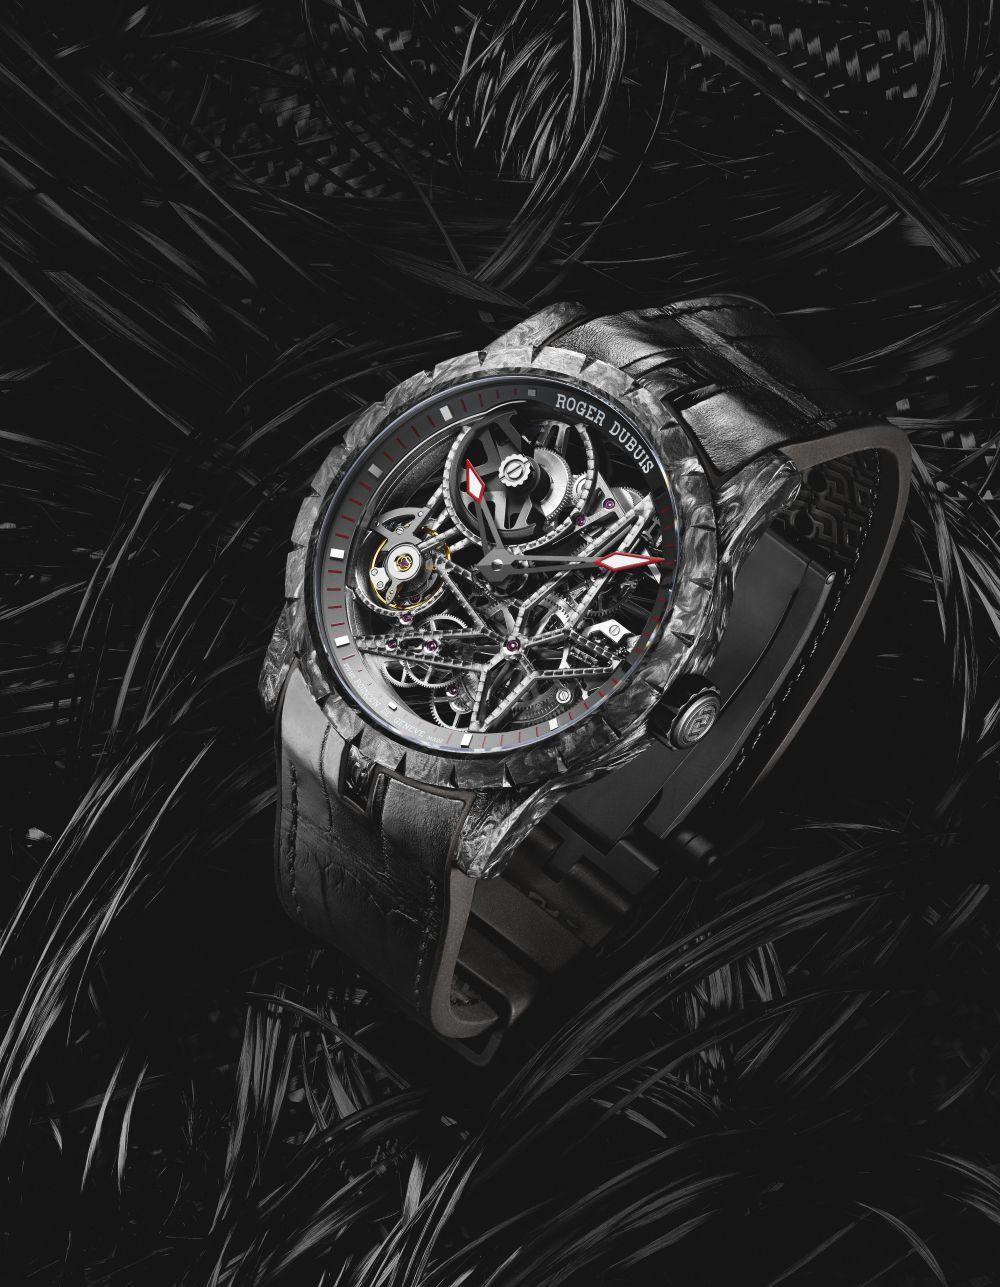 Roger-Dubuis-Excalibur-Automatic-Skeleton-Carbon-3.jpg